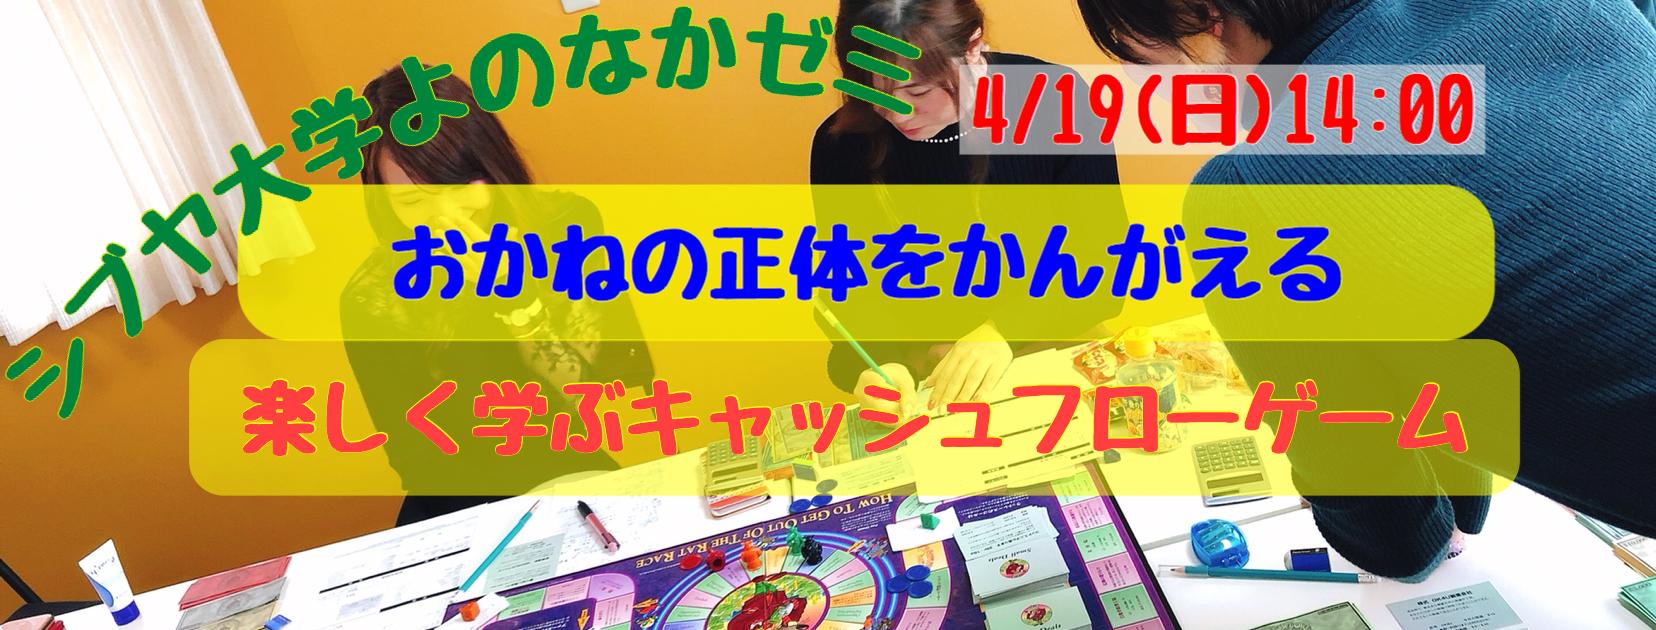 A1108325-597A-481E-8FB7-4ABC2D83AE53.jpeg